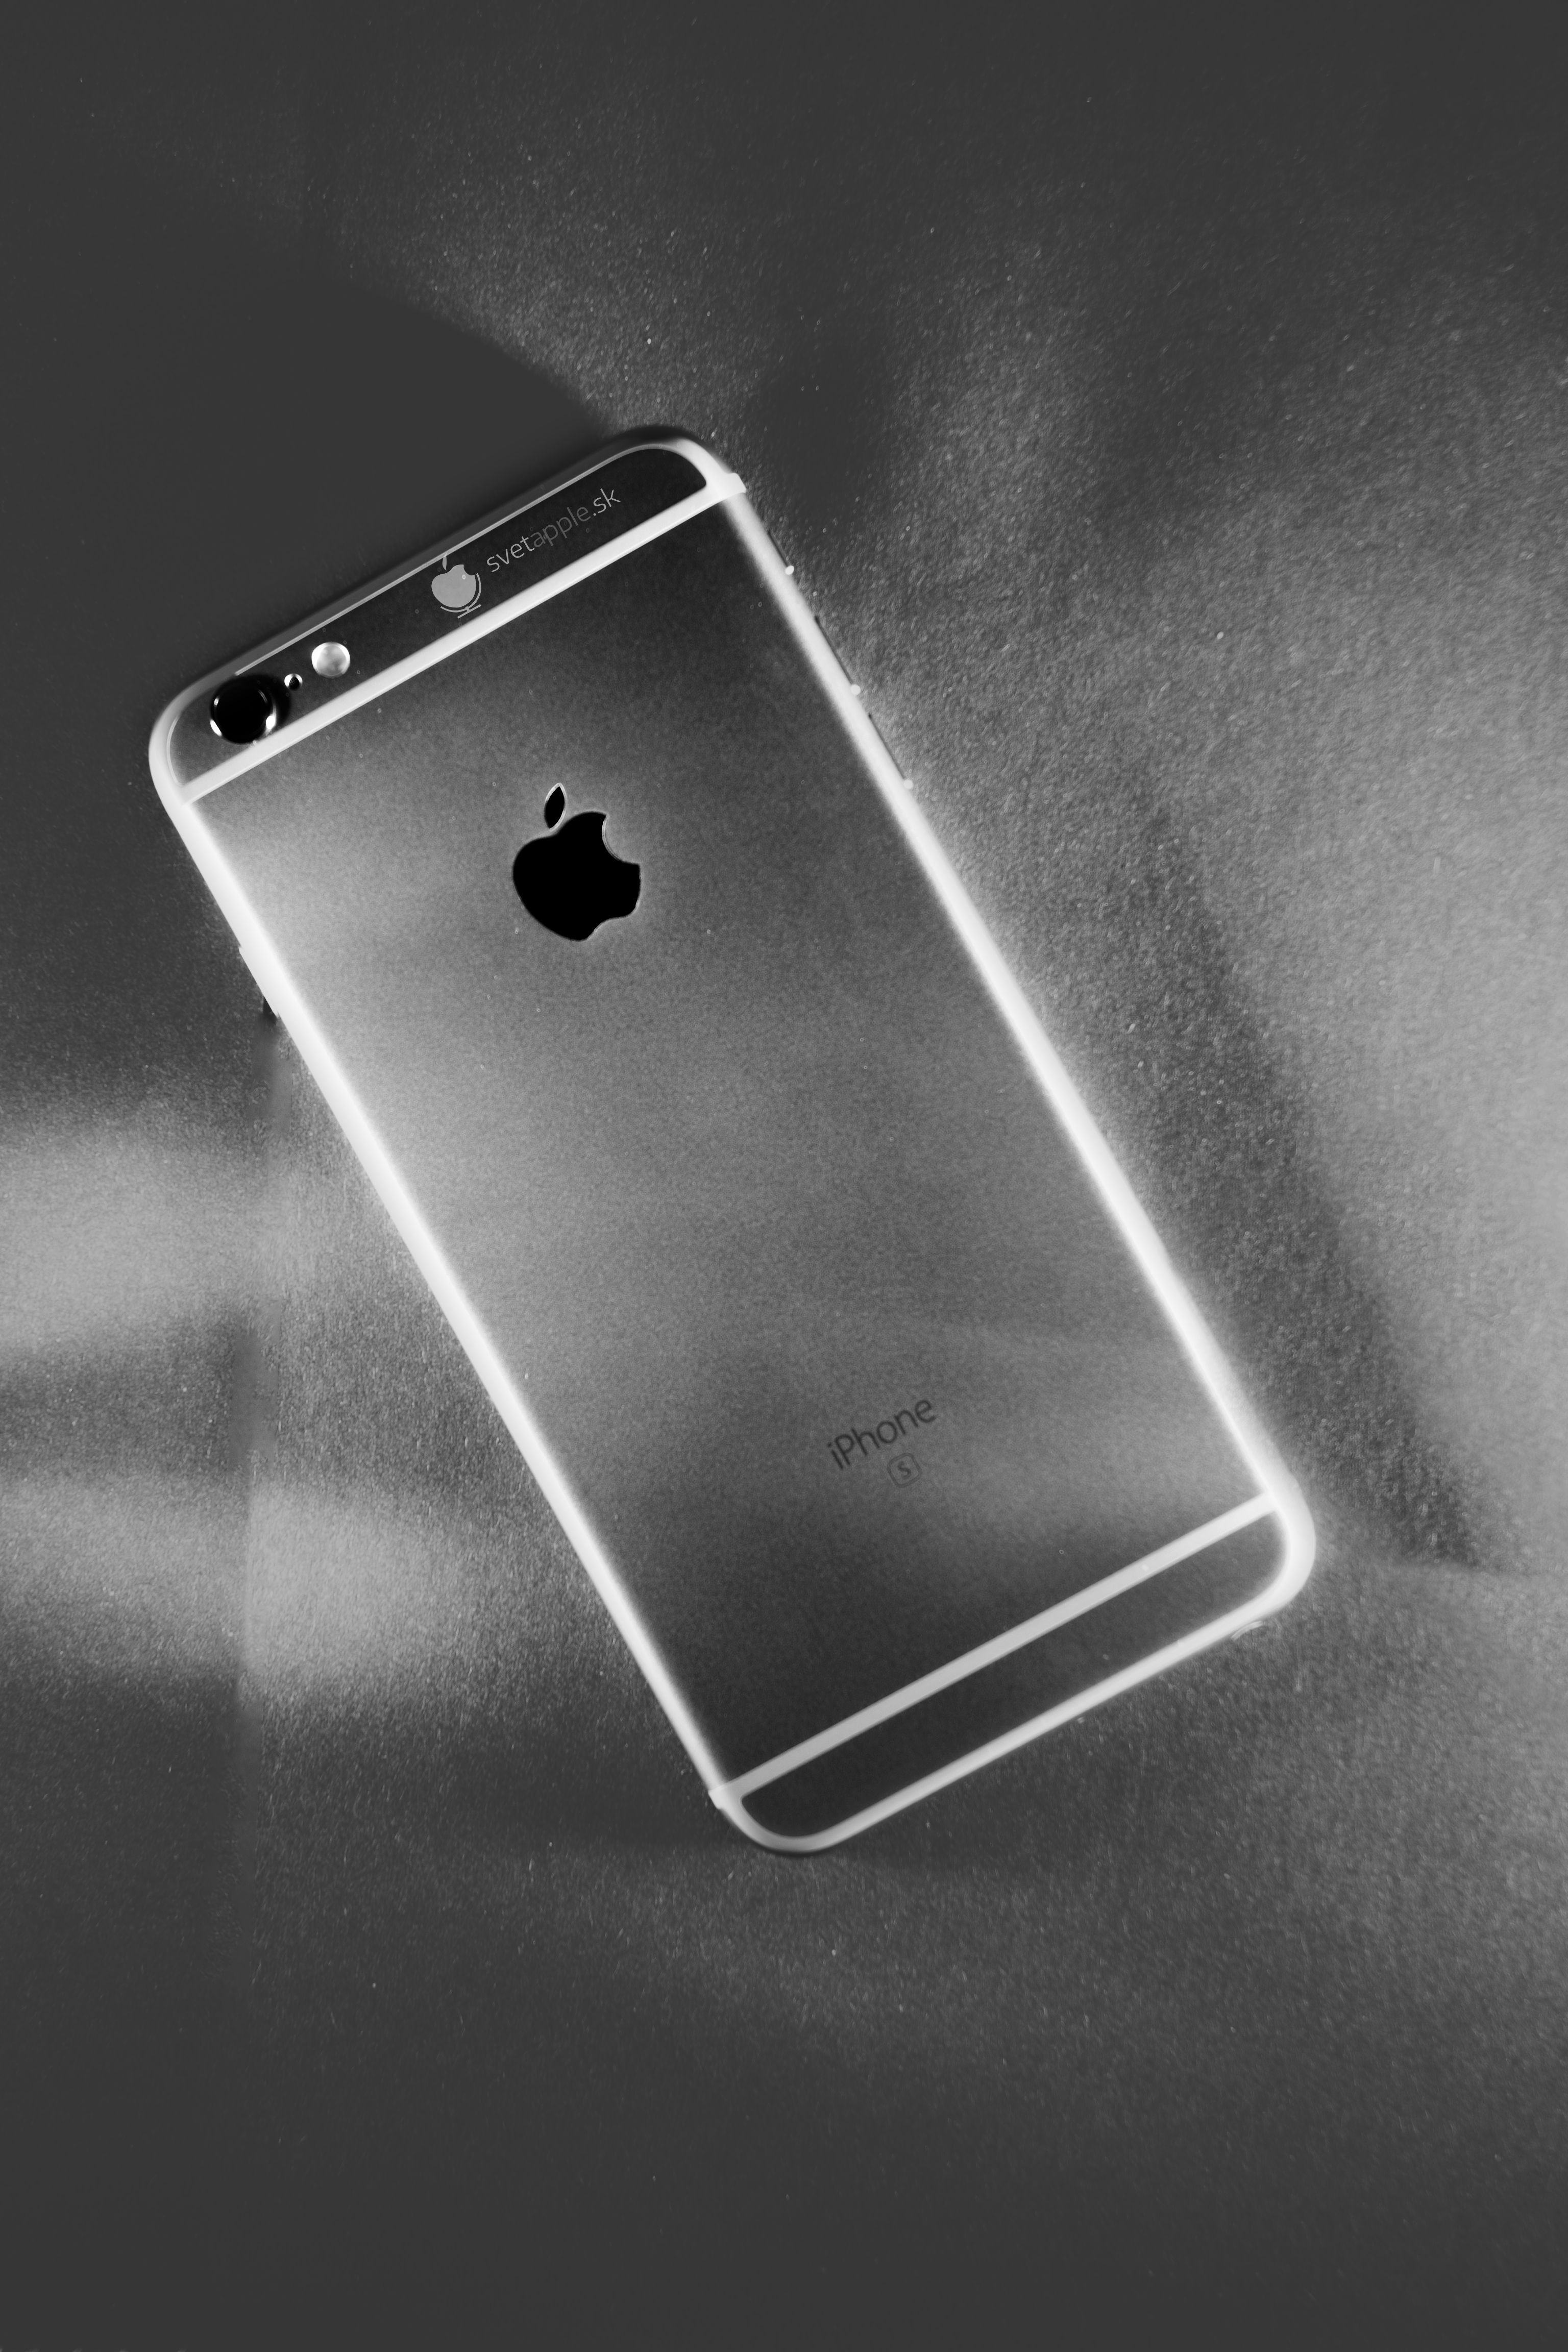 DSC_0429 - iPhone 6S (08.2015)